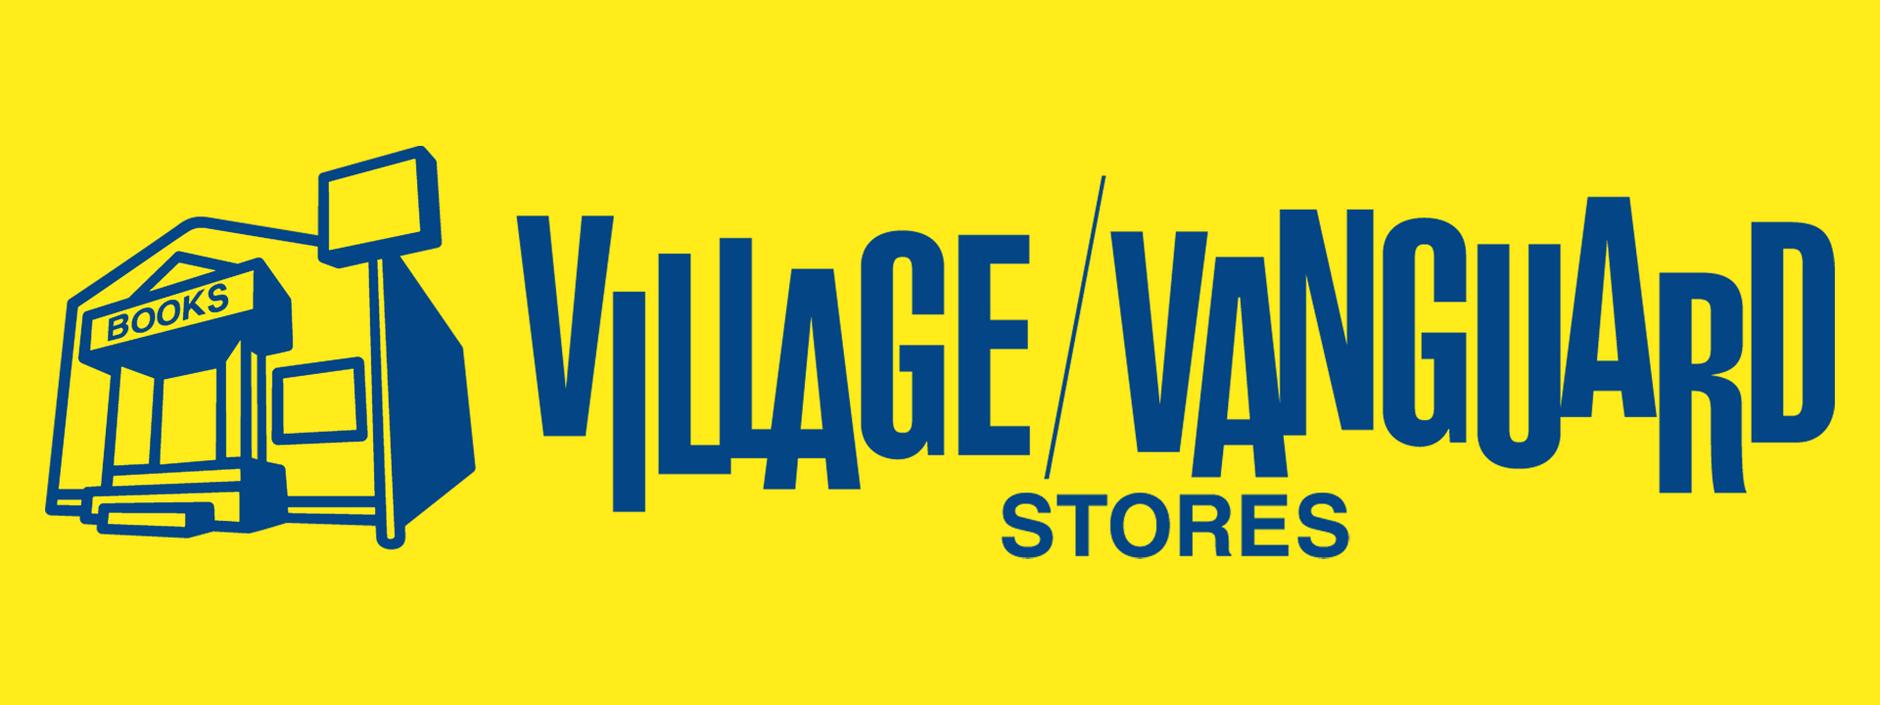 VILLAGE VANGUARD STORES